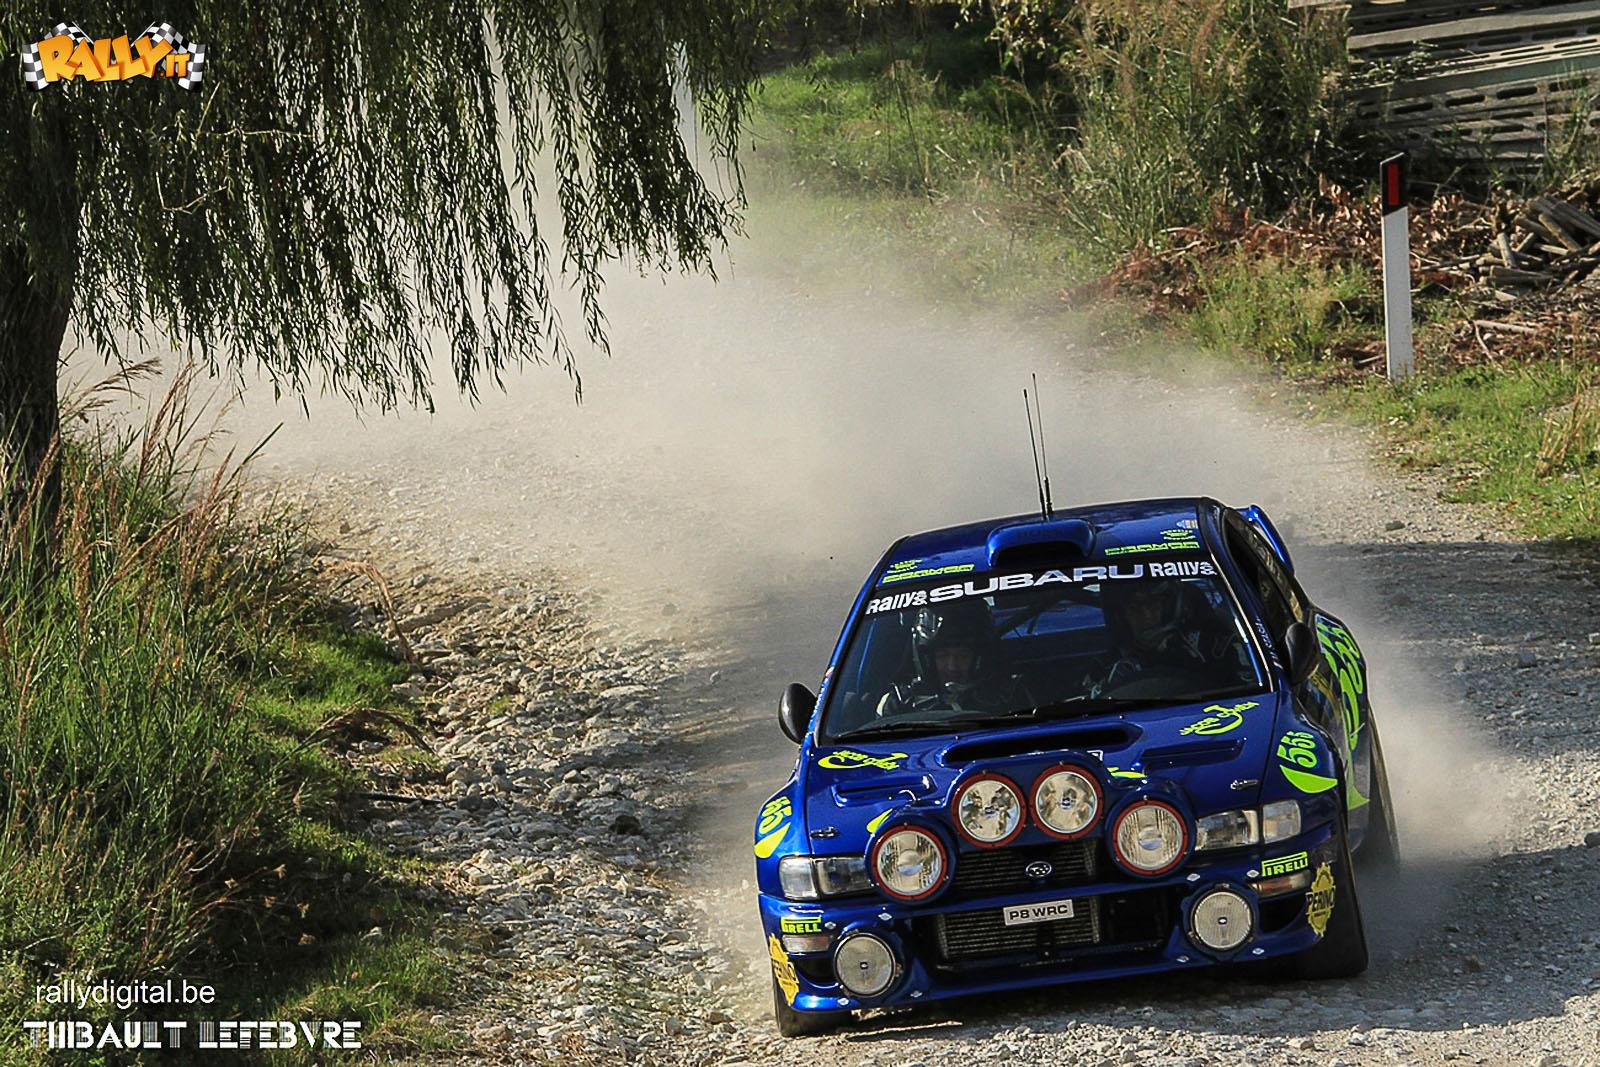 032-RallyLegend-2014.jpg